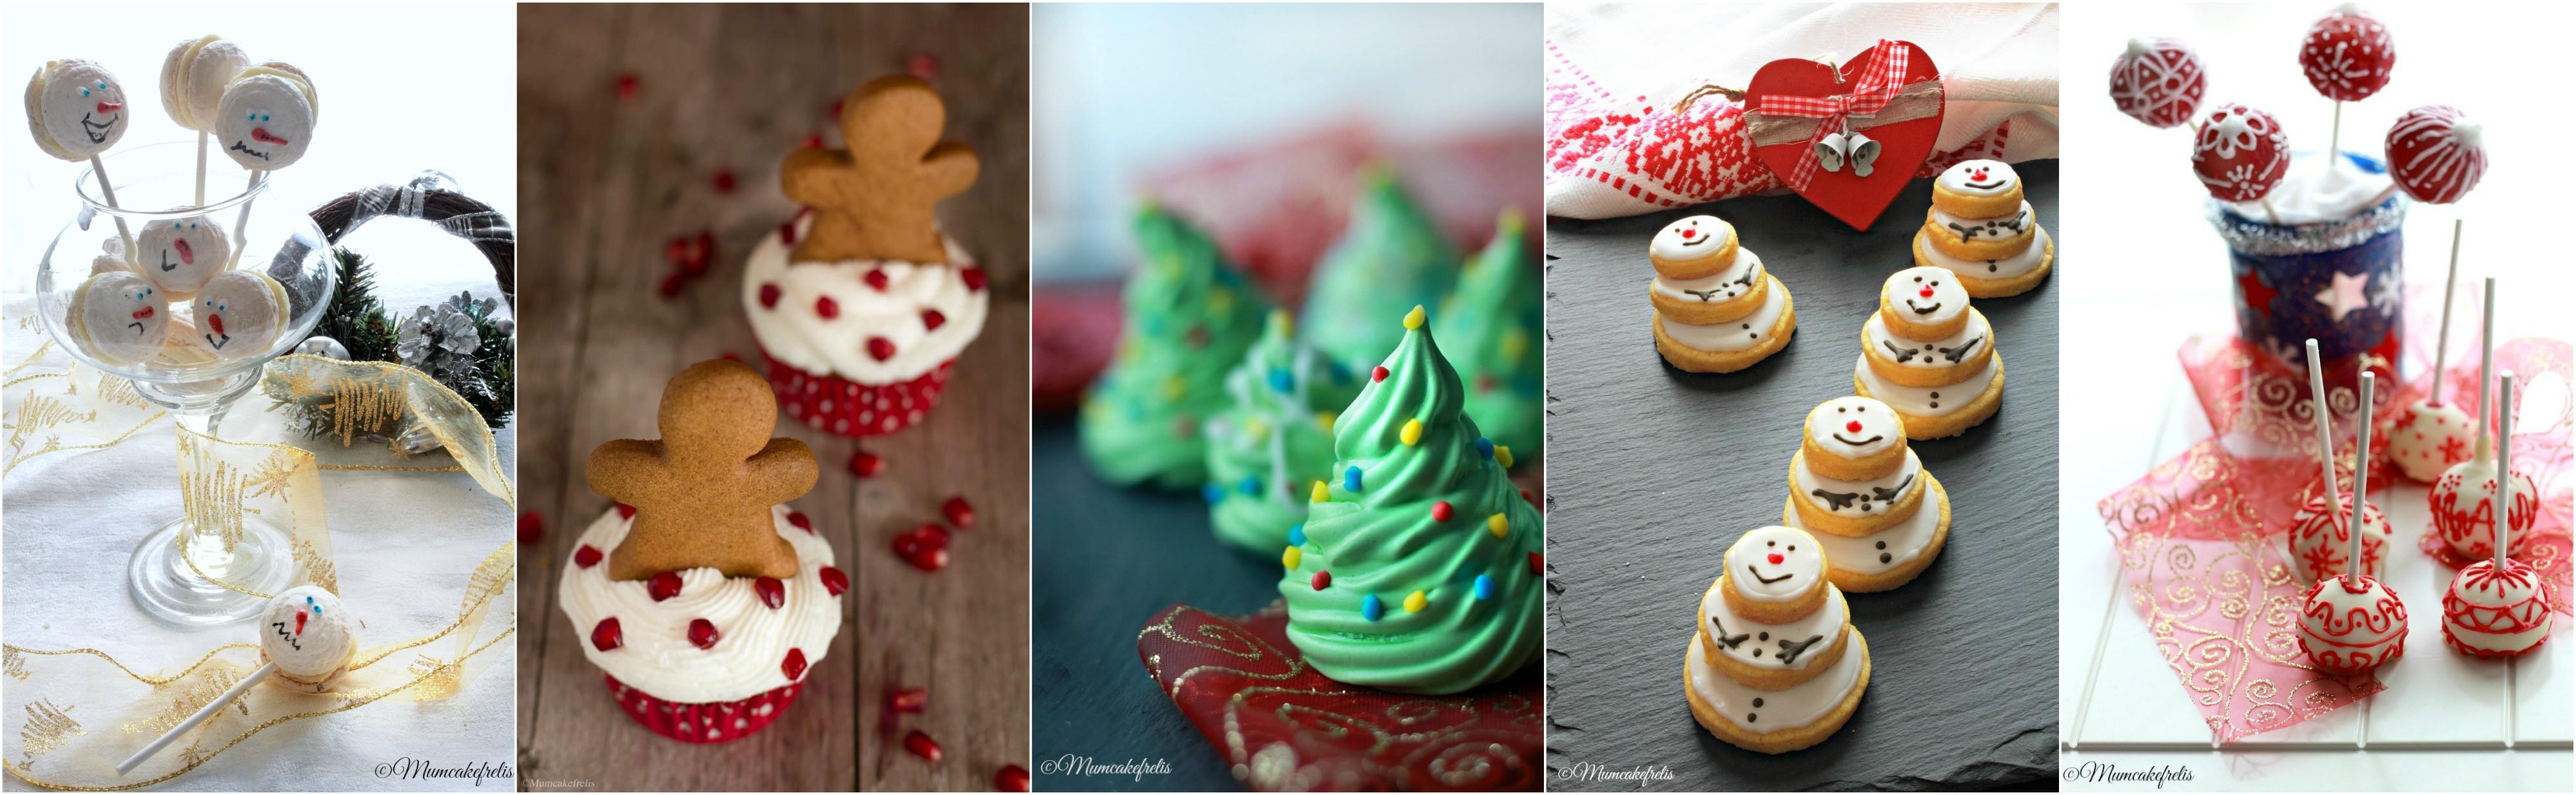 proposte di regali da mangiare fatti in casa